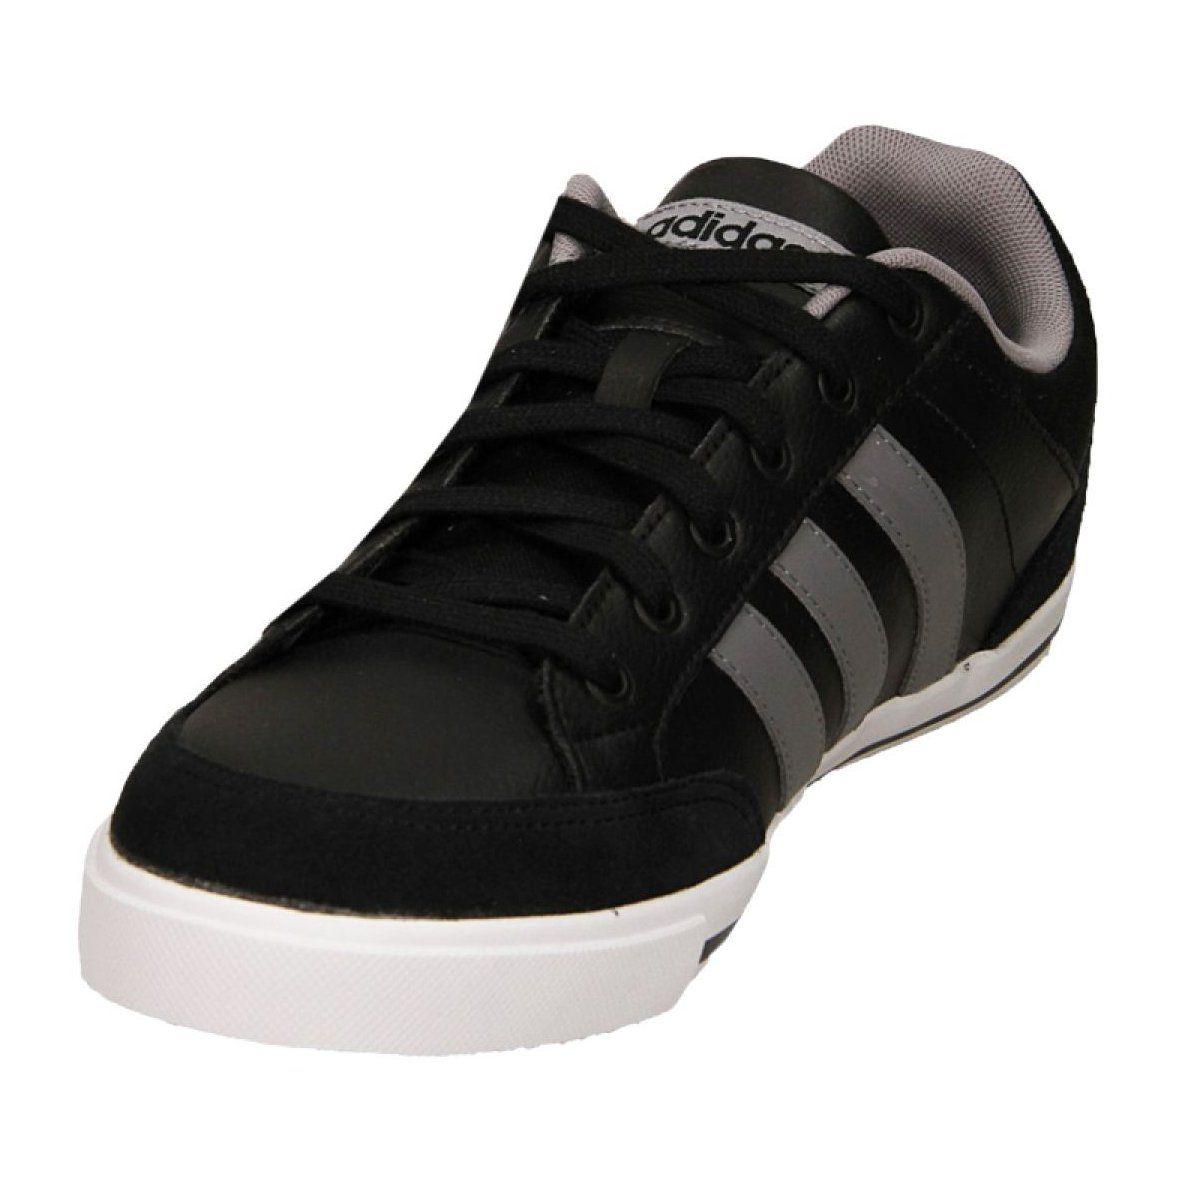 Buty Adidas Cacity M Bb9695 Czarne Sports Shoes Adidas Black Shoes Adidas